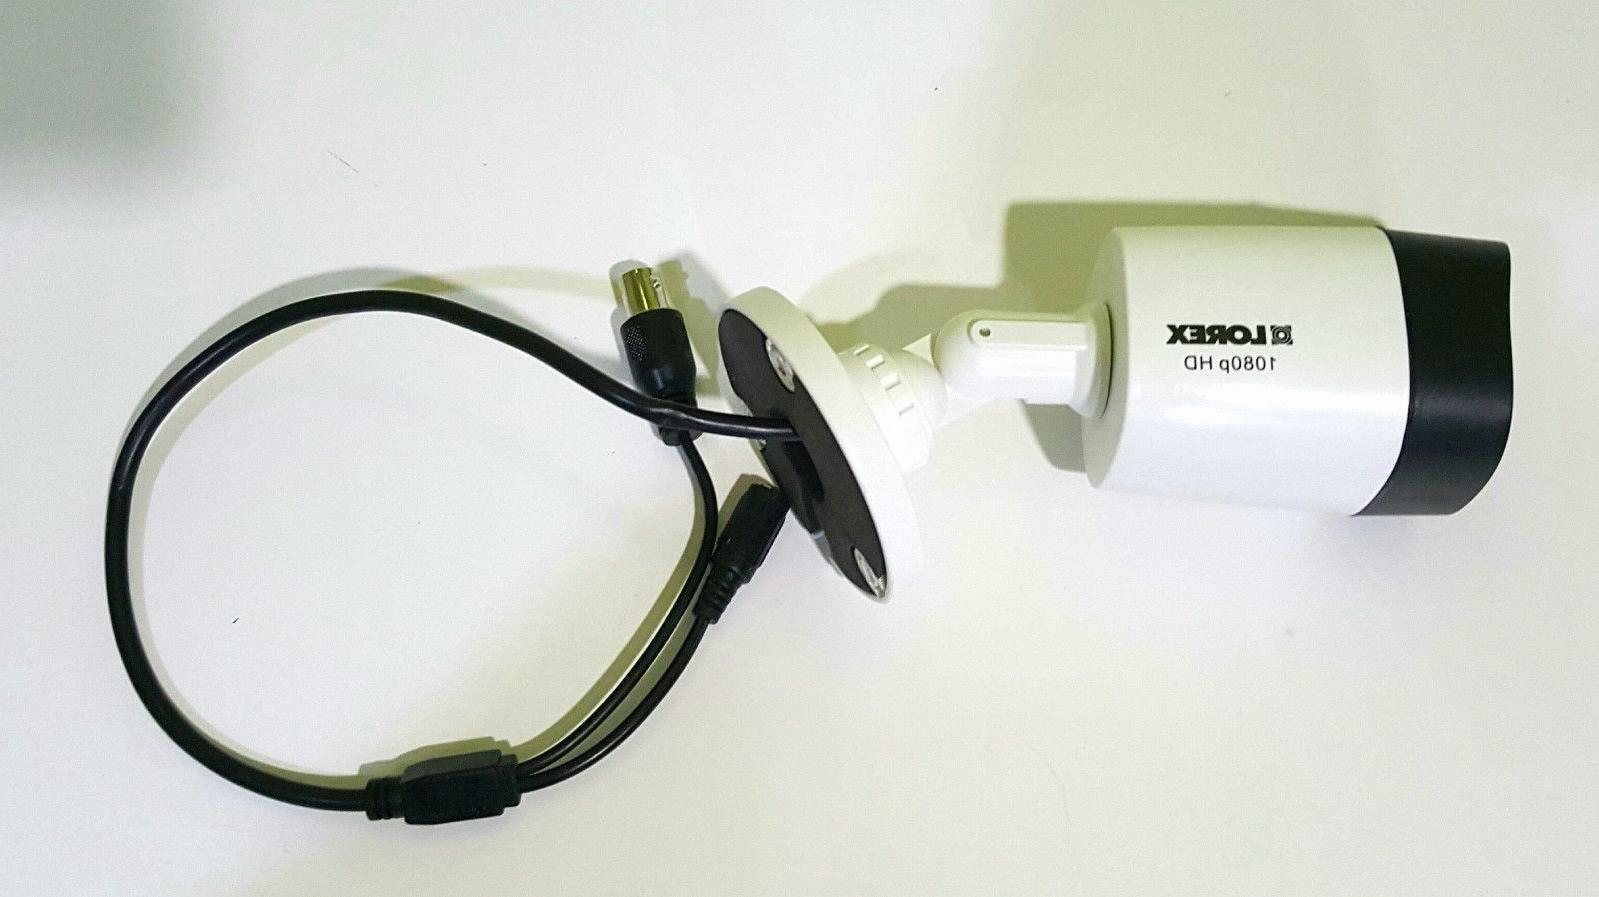 Lorex 1080P In/Outdoor Cameras 130' Vision LBV2521-C